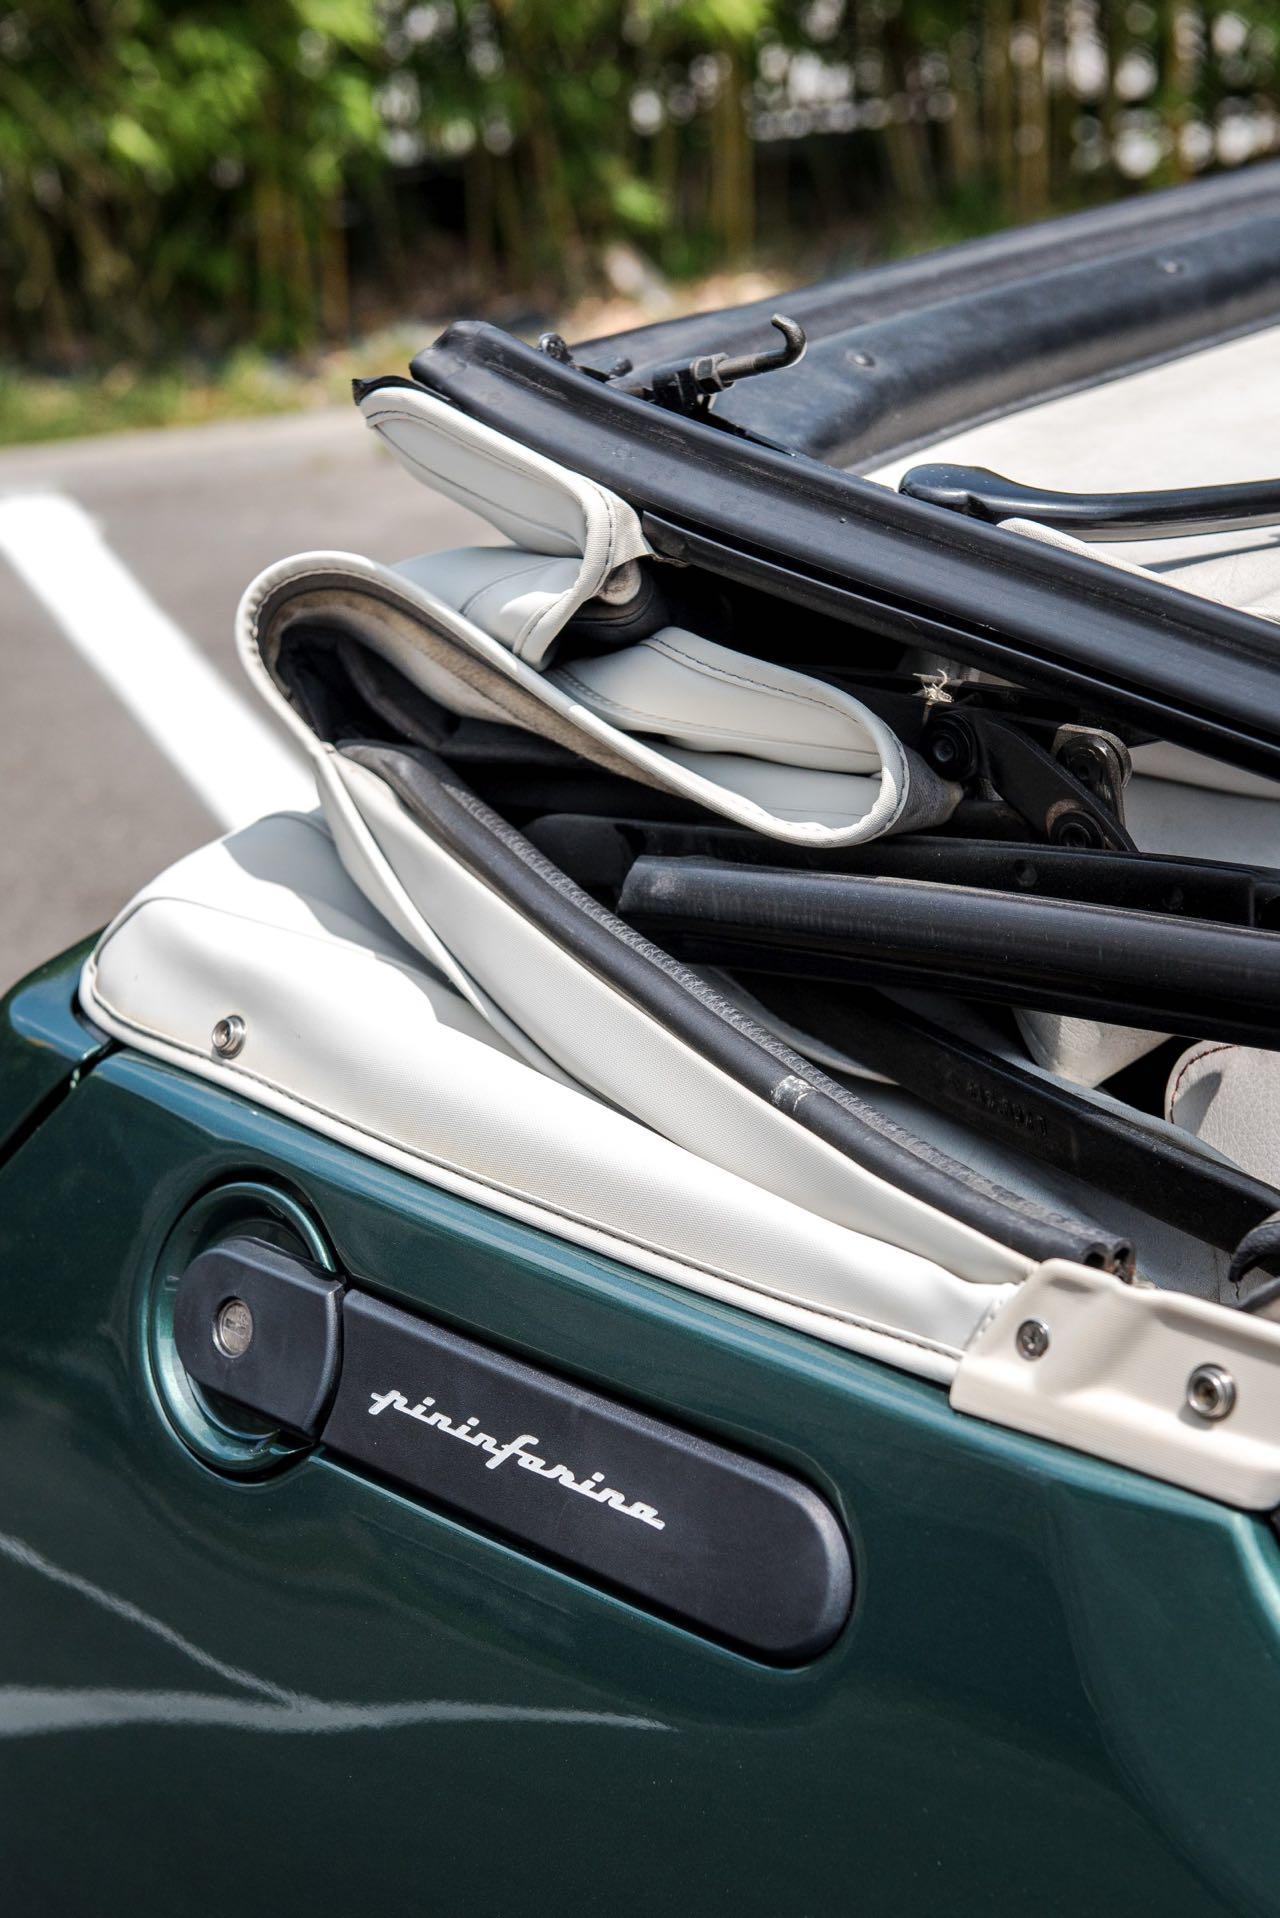 Peugeot 205 Cabriolet Roland Garros - Jeu, set et match ! 7